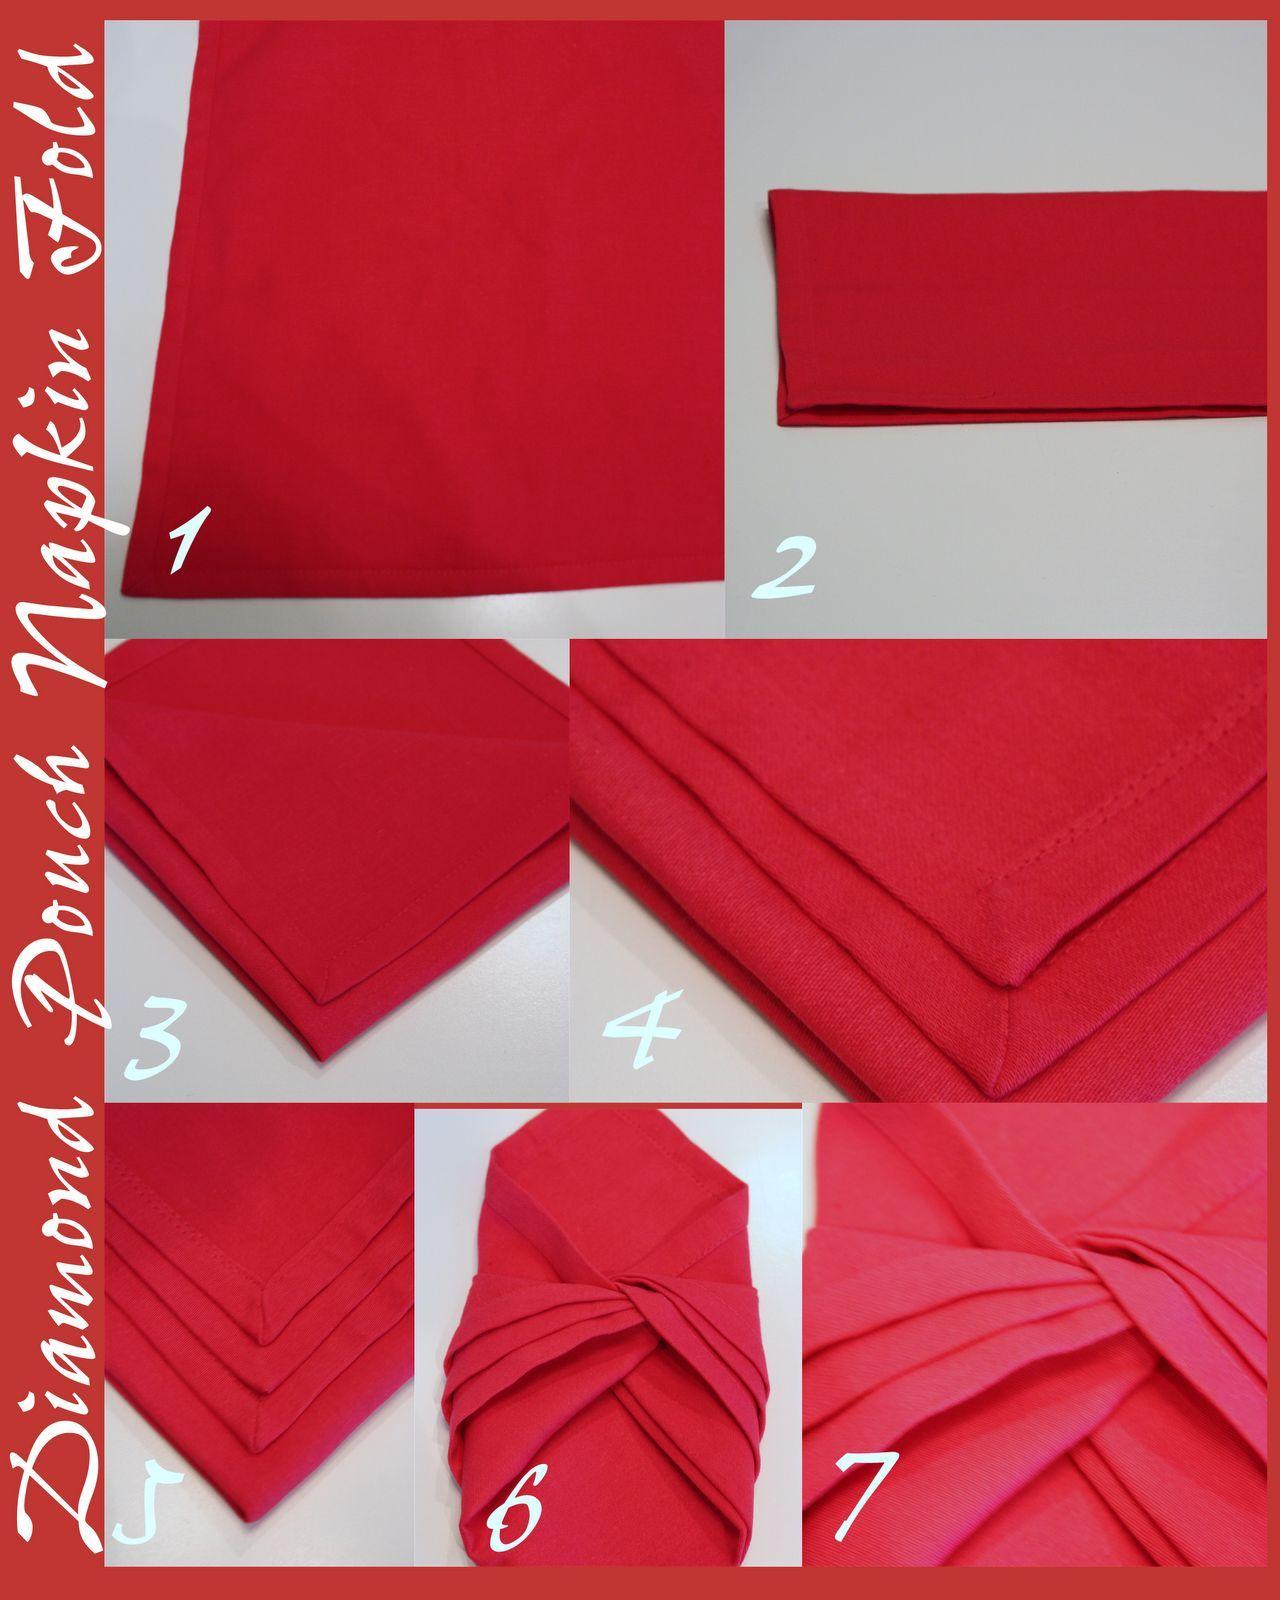 Napkin Folding Ideas For Weddings: Napkins, Napkin Folding, Wedding